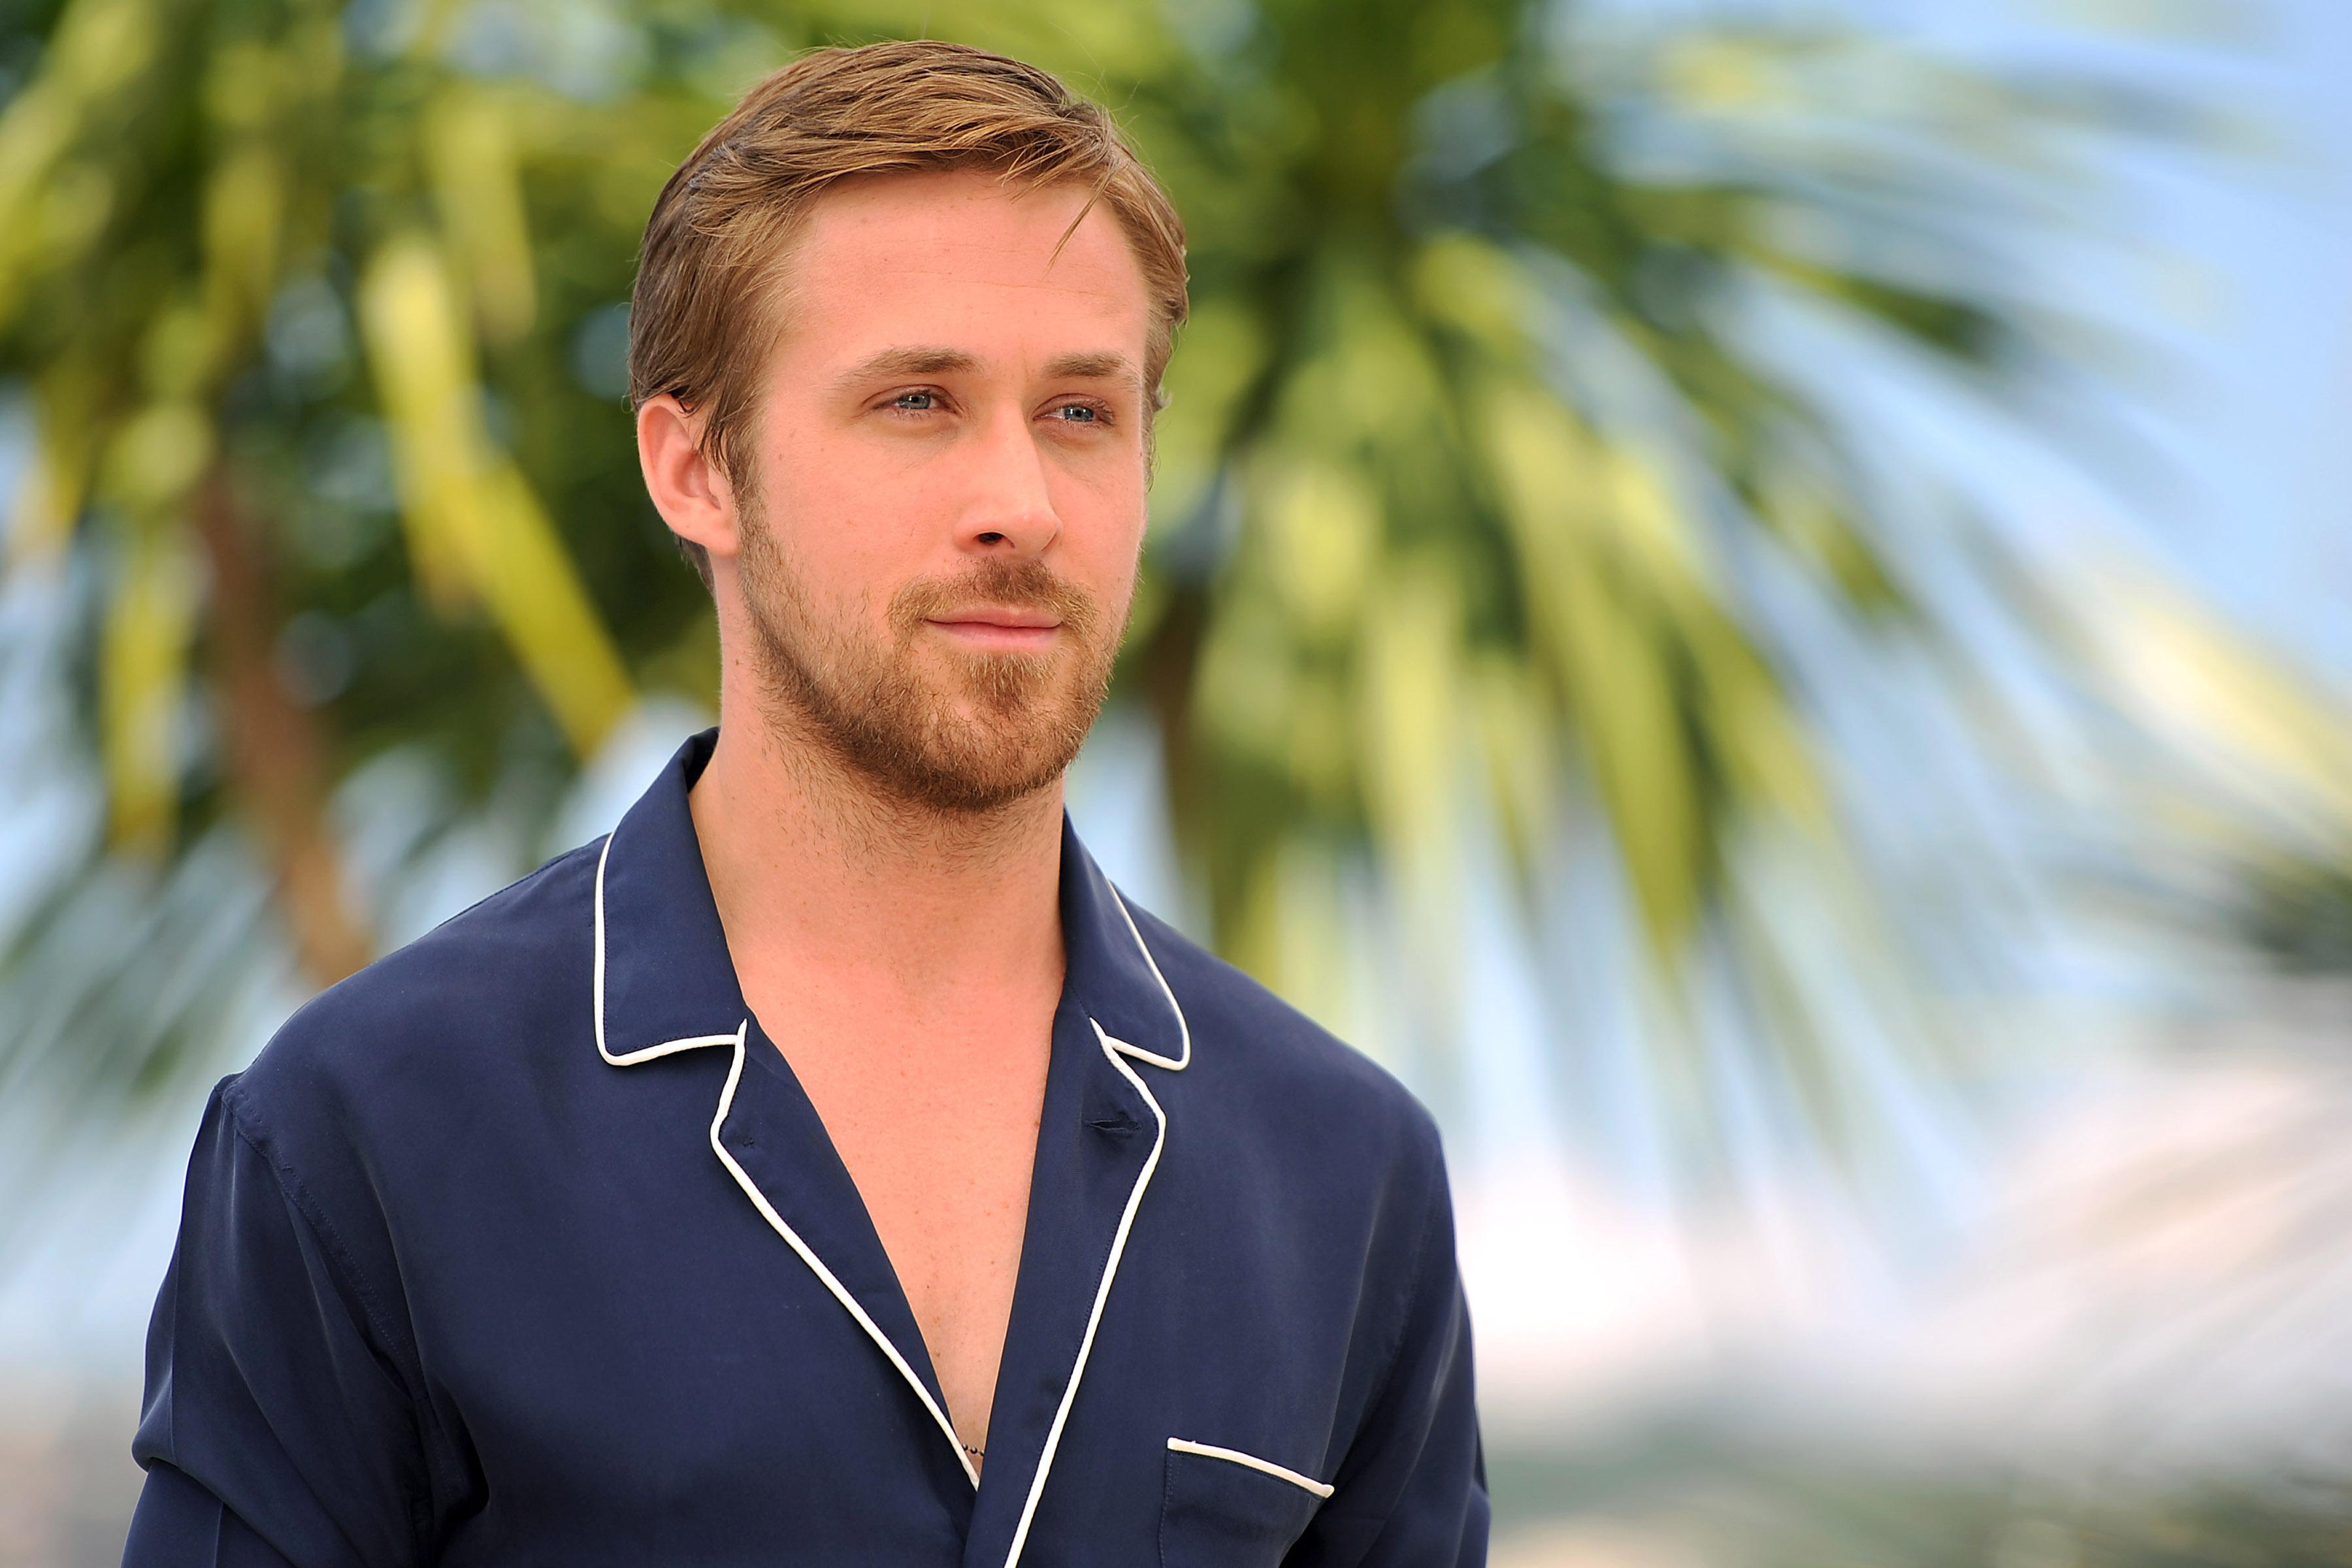 More Beautiful Ryan Gosling Wallpaper FLgrx Graphics 3600x2400